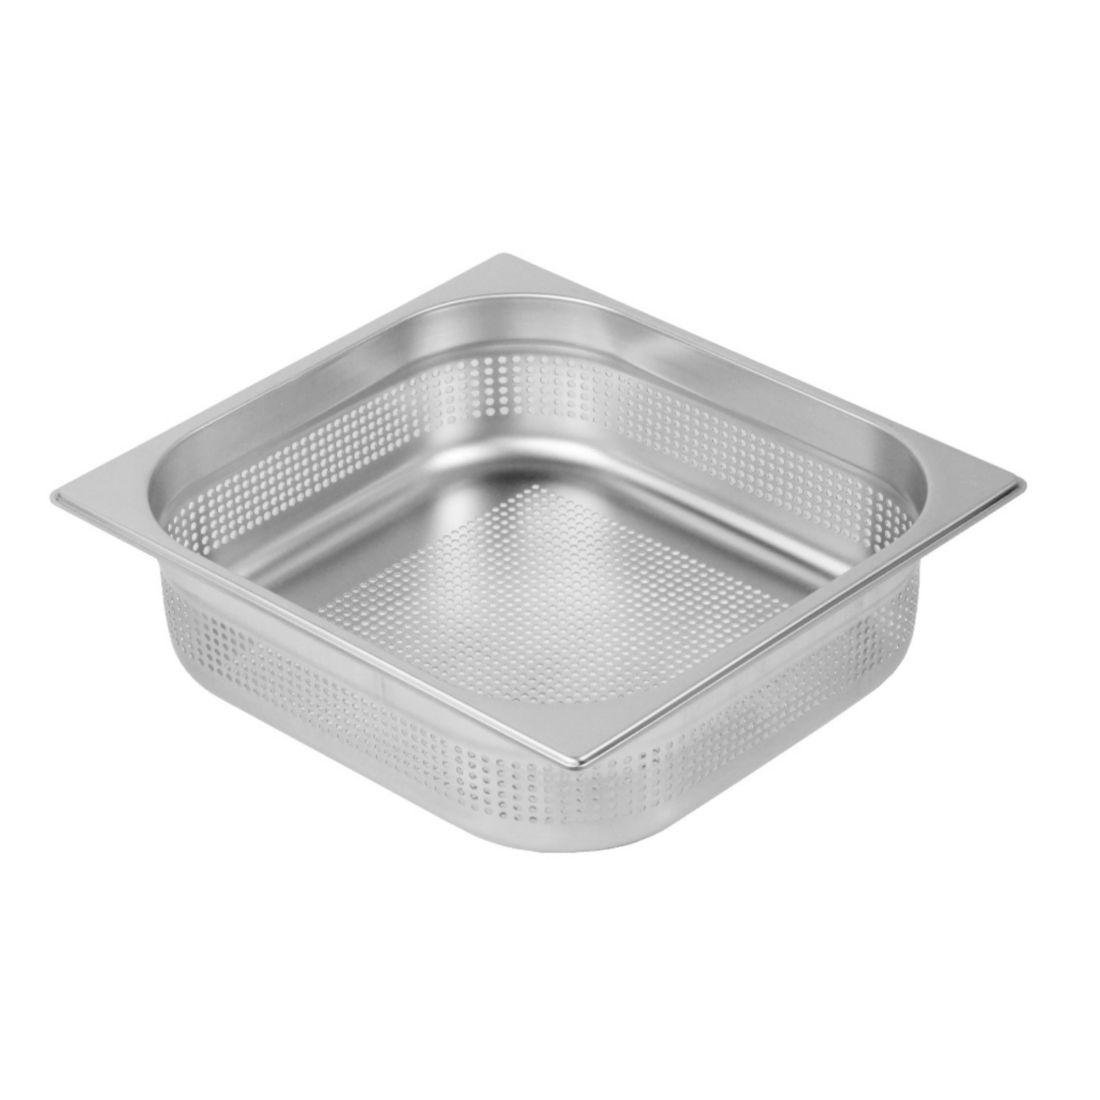 Gastronádoba Profi děrovaná GN 2/3 020 mm